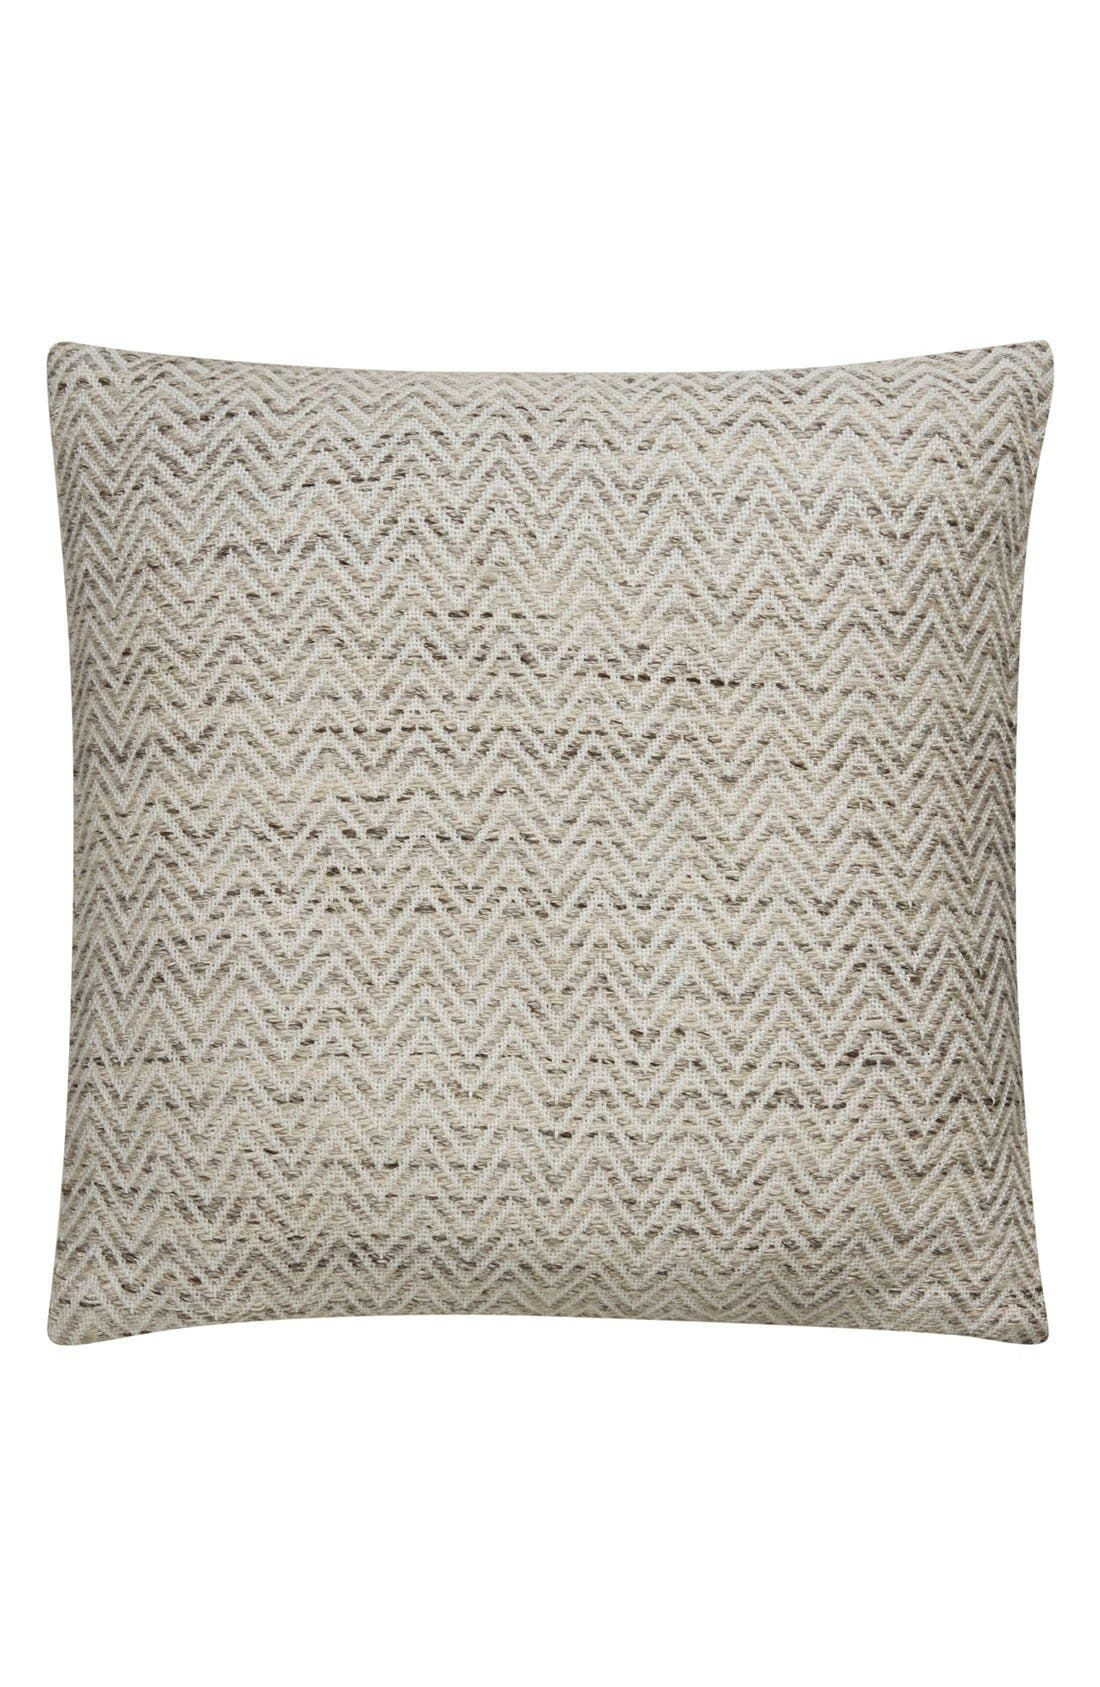 Jaipur 'Peykan' Pillow